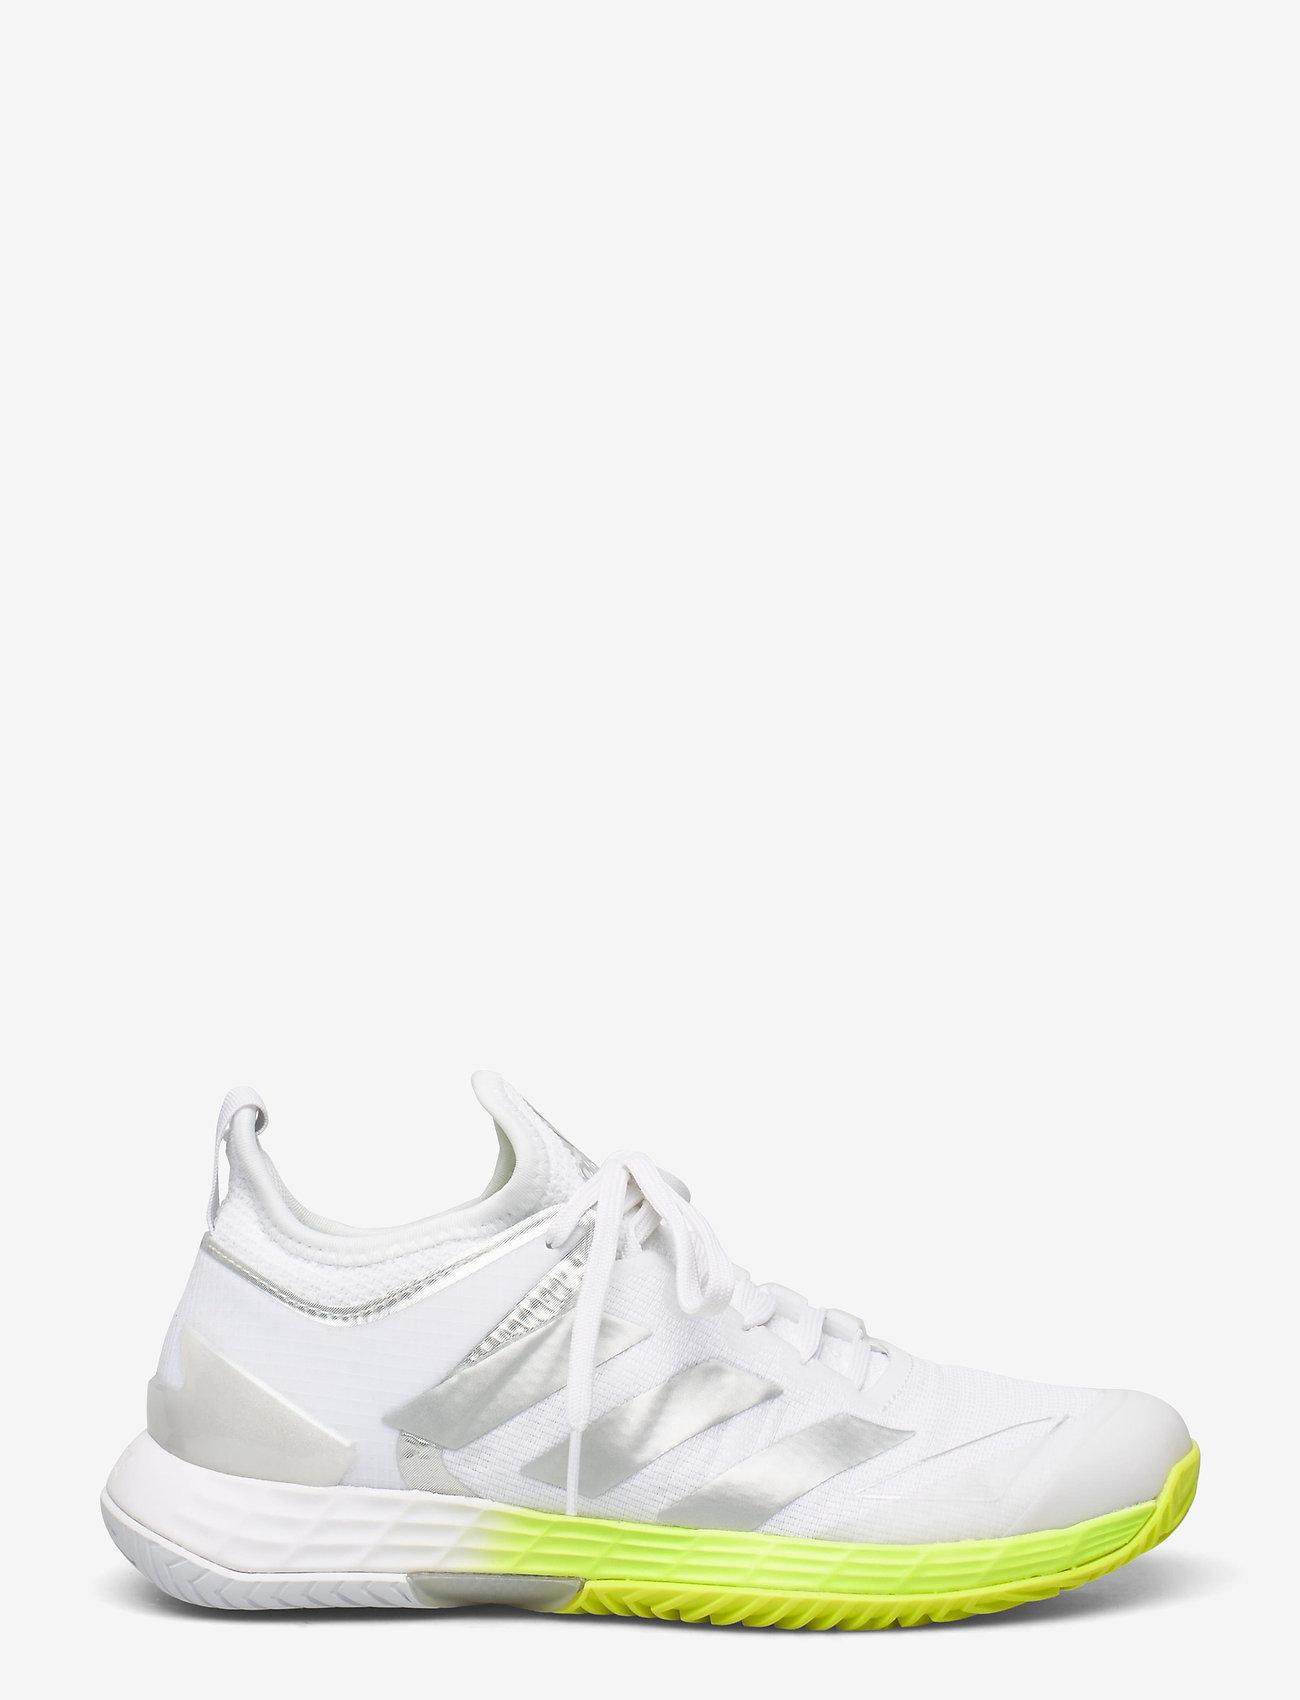 adidas Performance - Adizero Ubersonic 4 Tennis Shoes - ketsjersportsko - white - 0